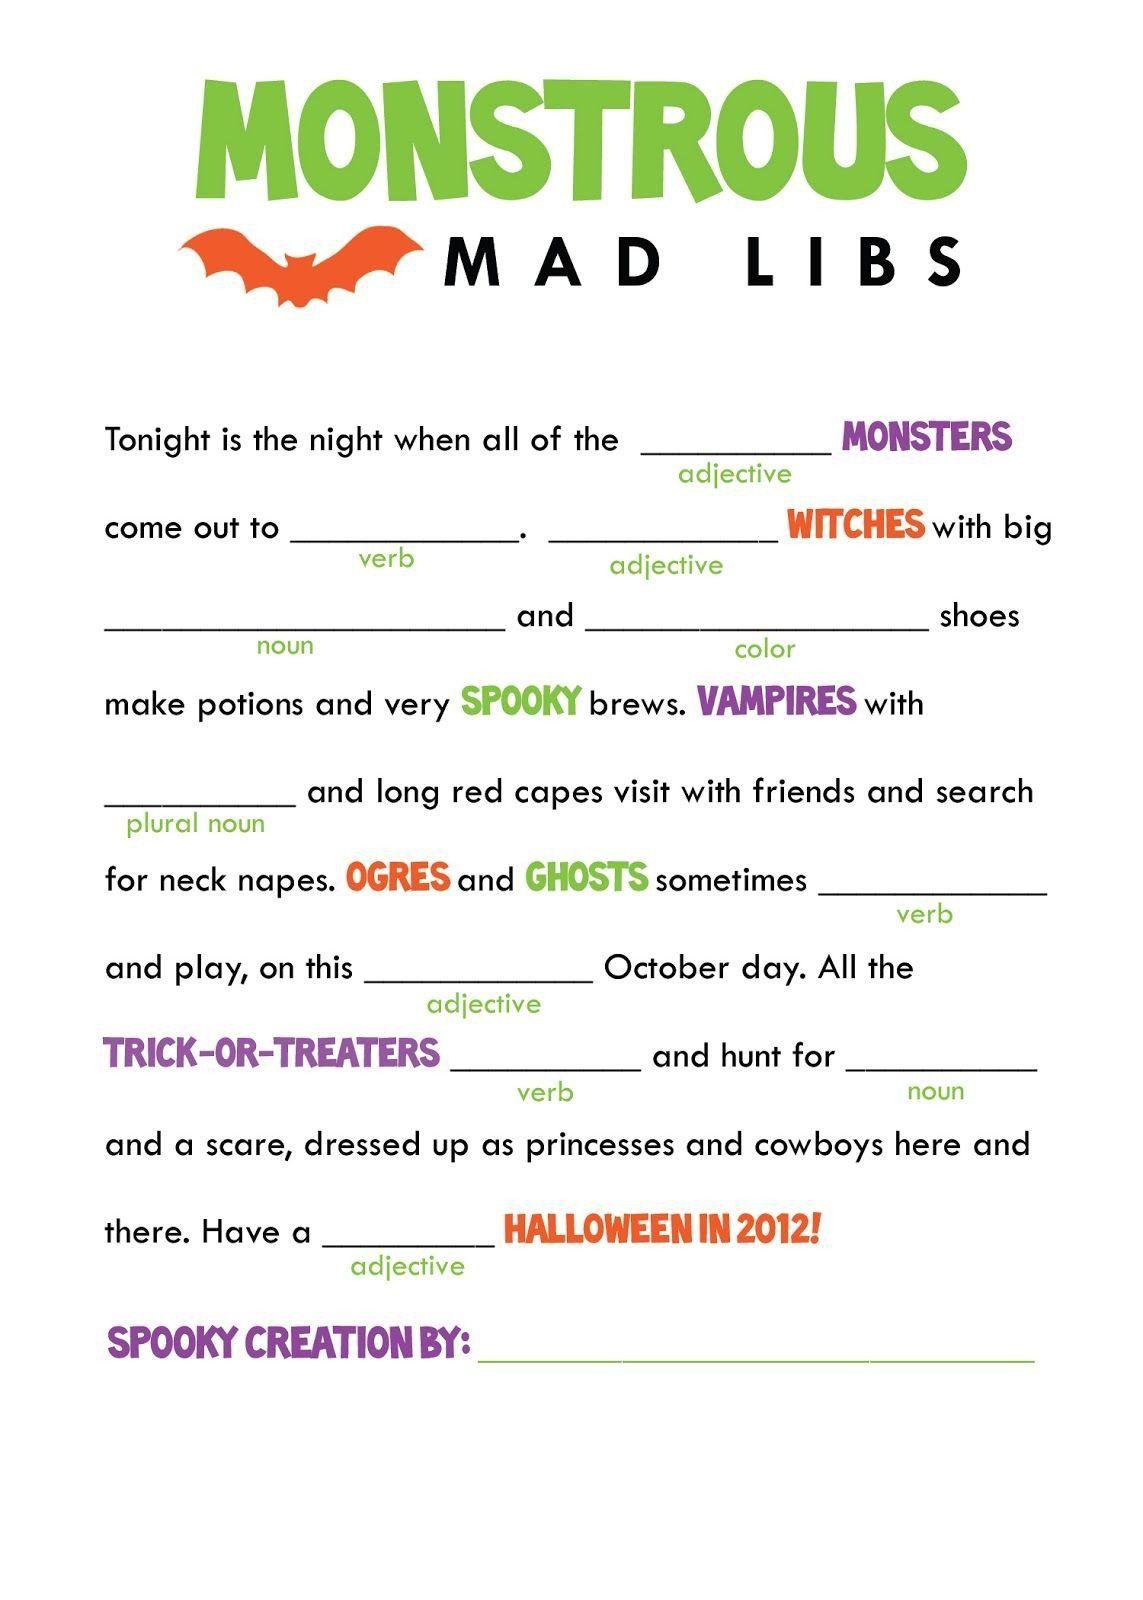 5th Grade Halloween Worksheets Kids Mad Libs Printable